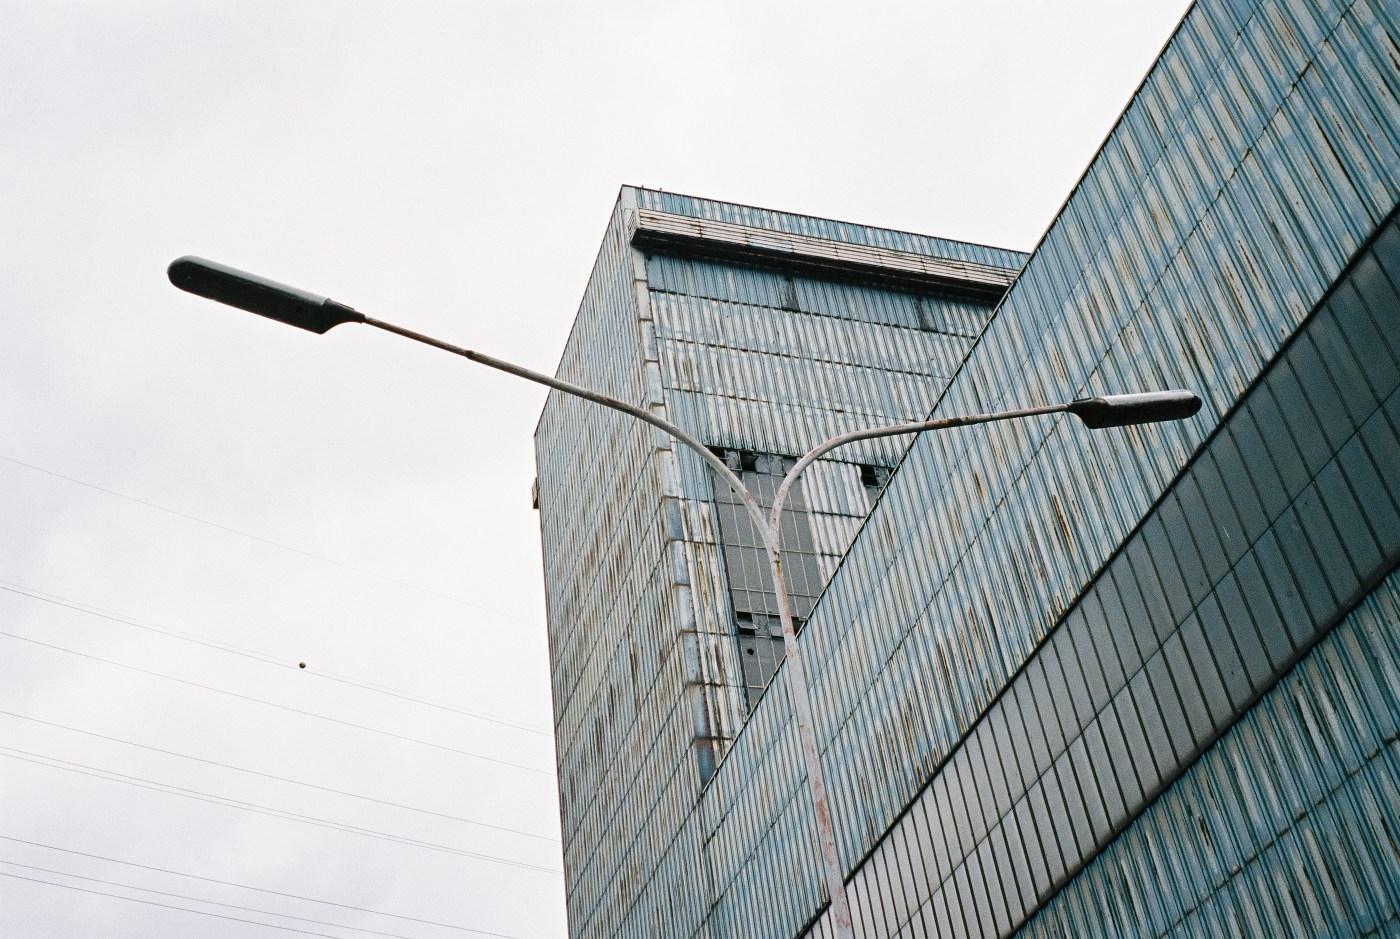 000024JoergBergs-KodakPortra400-MeinFilmLab-M7-35